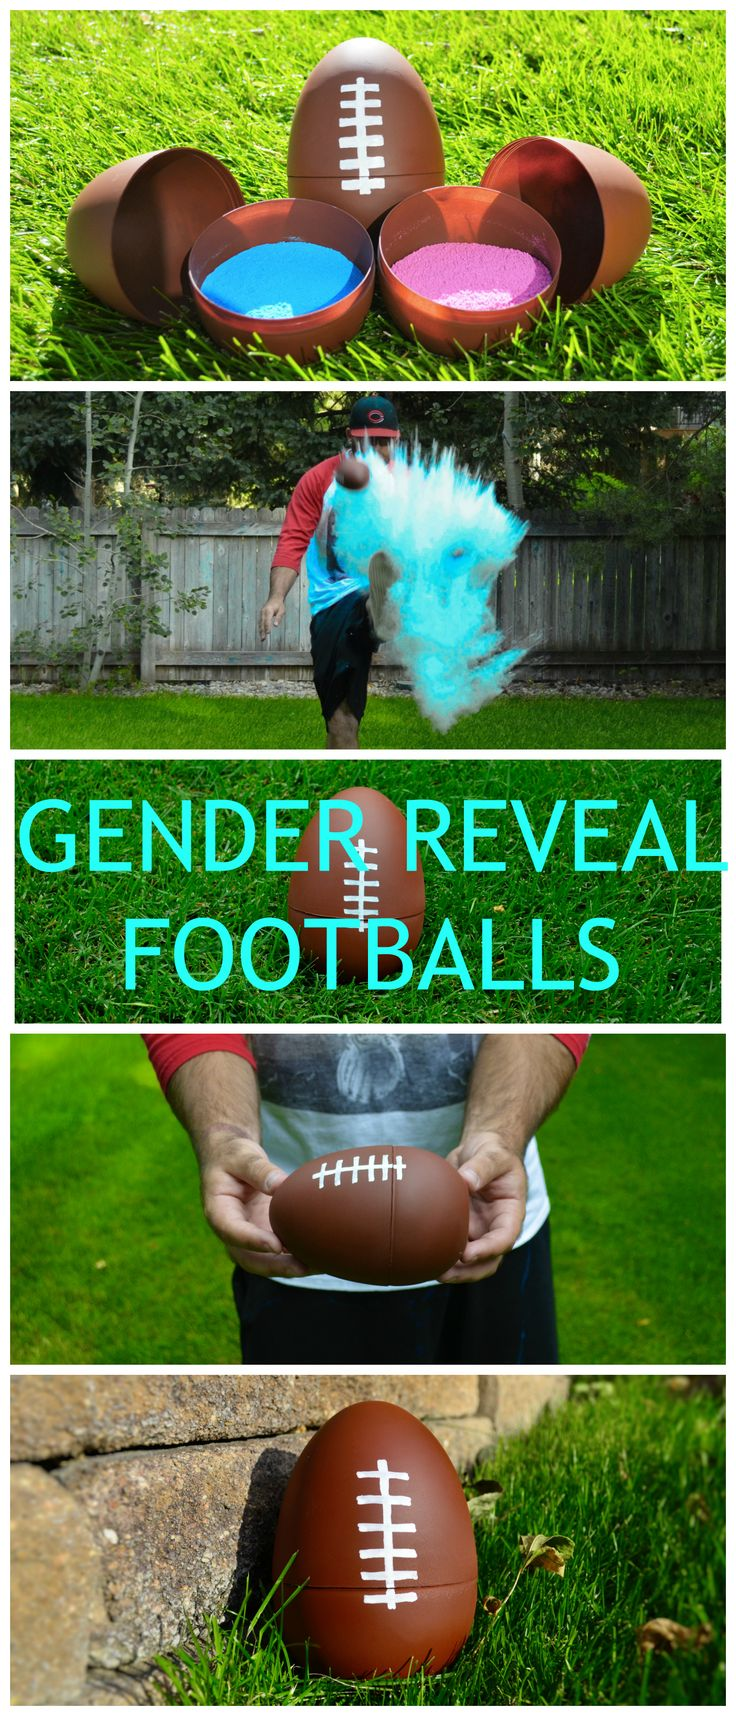 FOOTBALL GENDER REVEAL PARTY! Cute Gender Reveal Idea